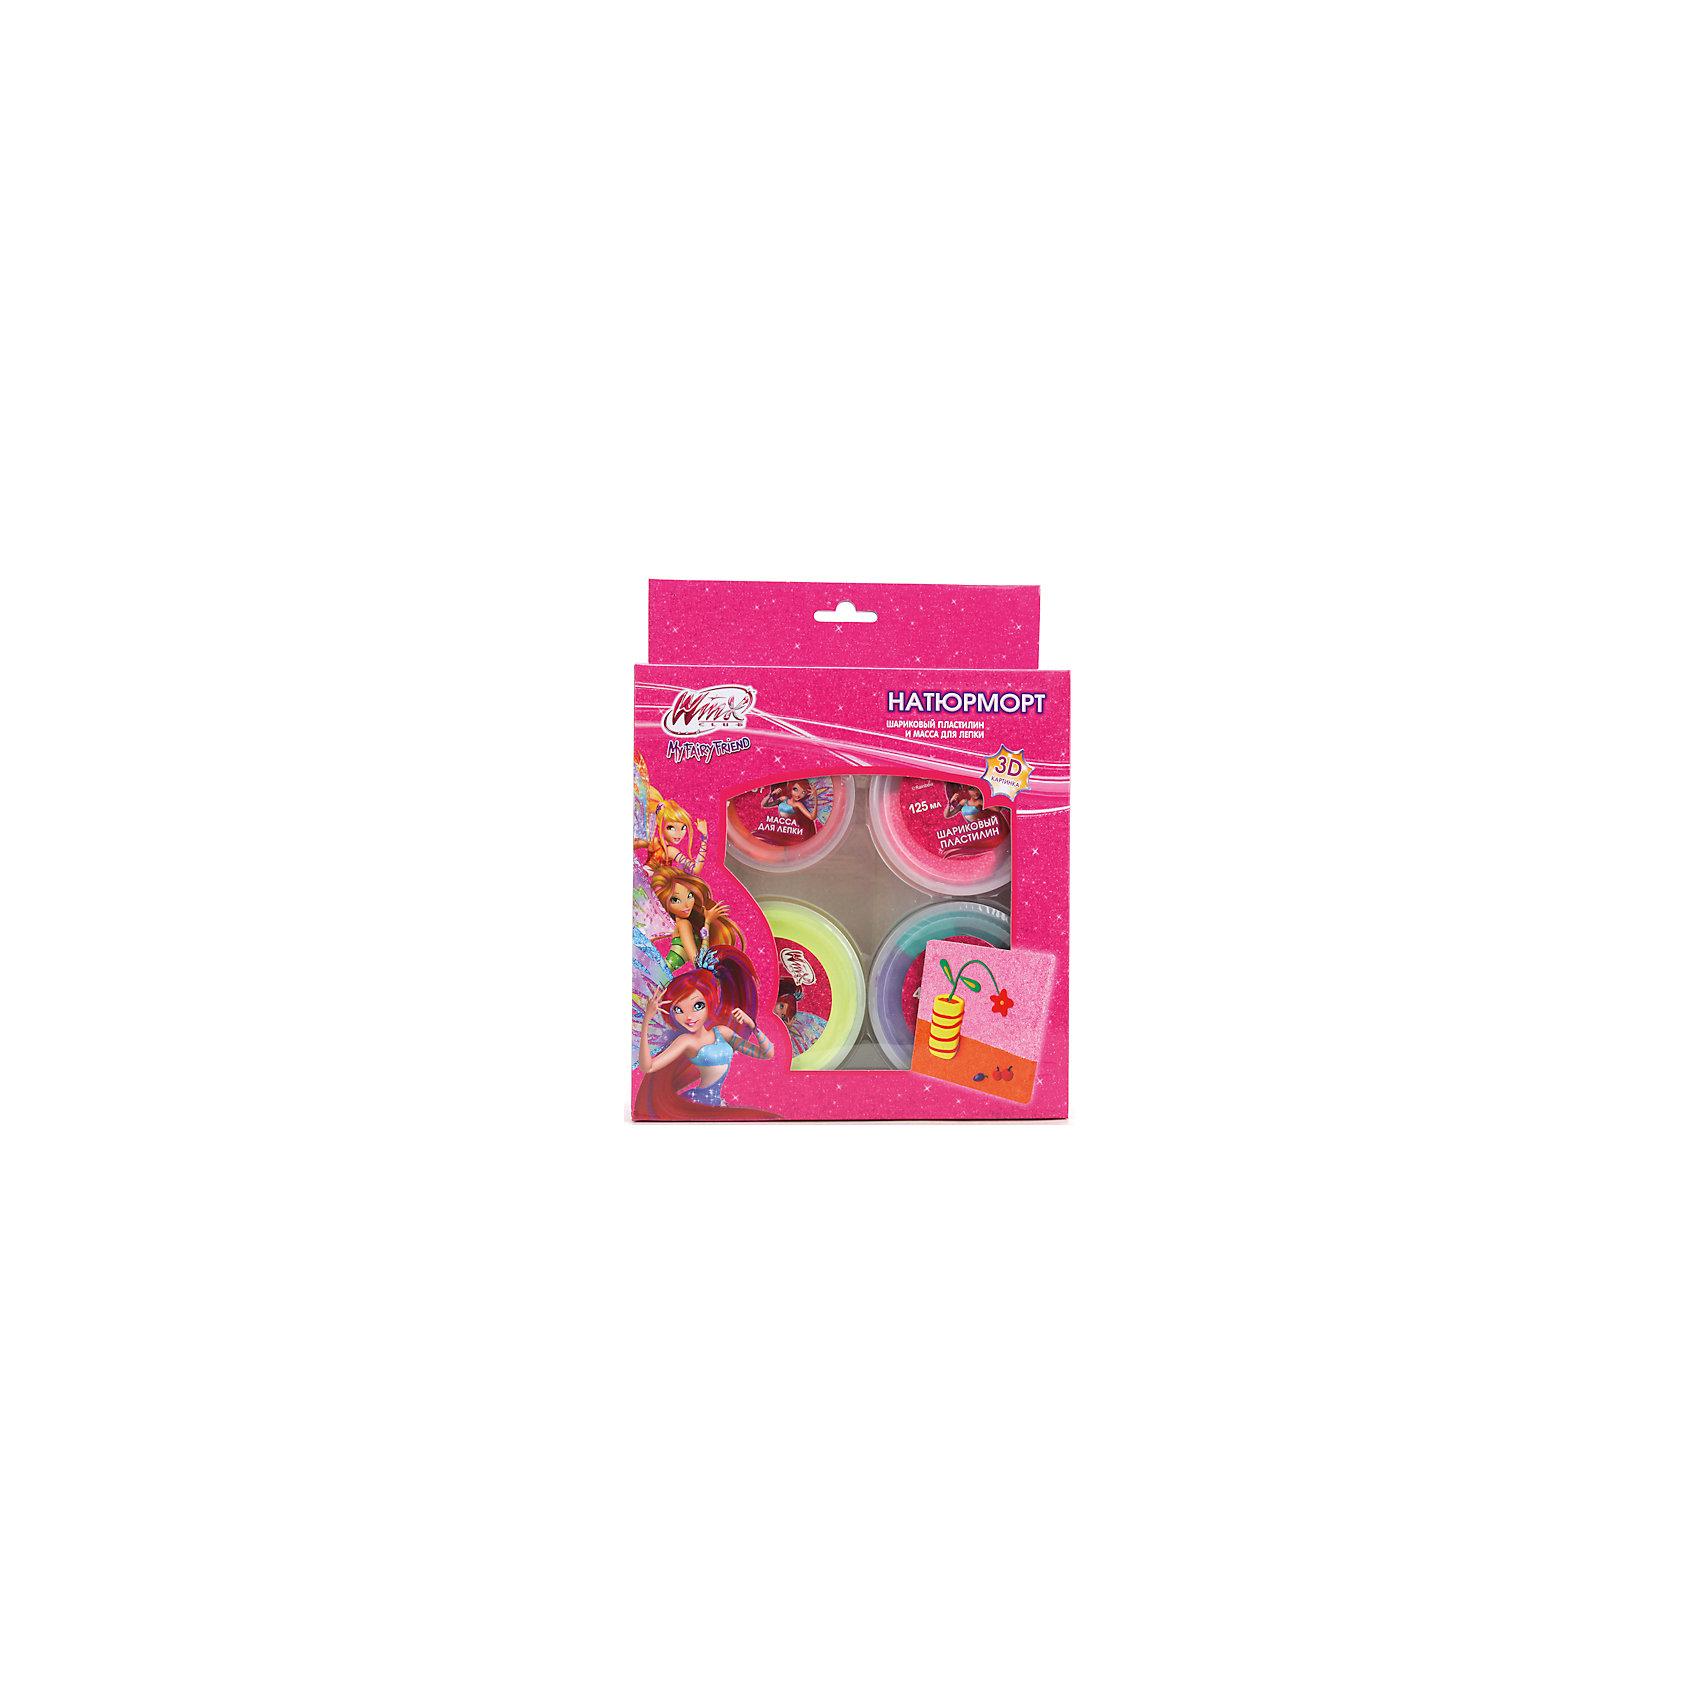 Играем вместе Набор для лепки картинки Натюрморт, Winx Club всё для лепки lori пластилин классика 16 цветов